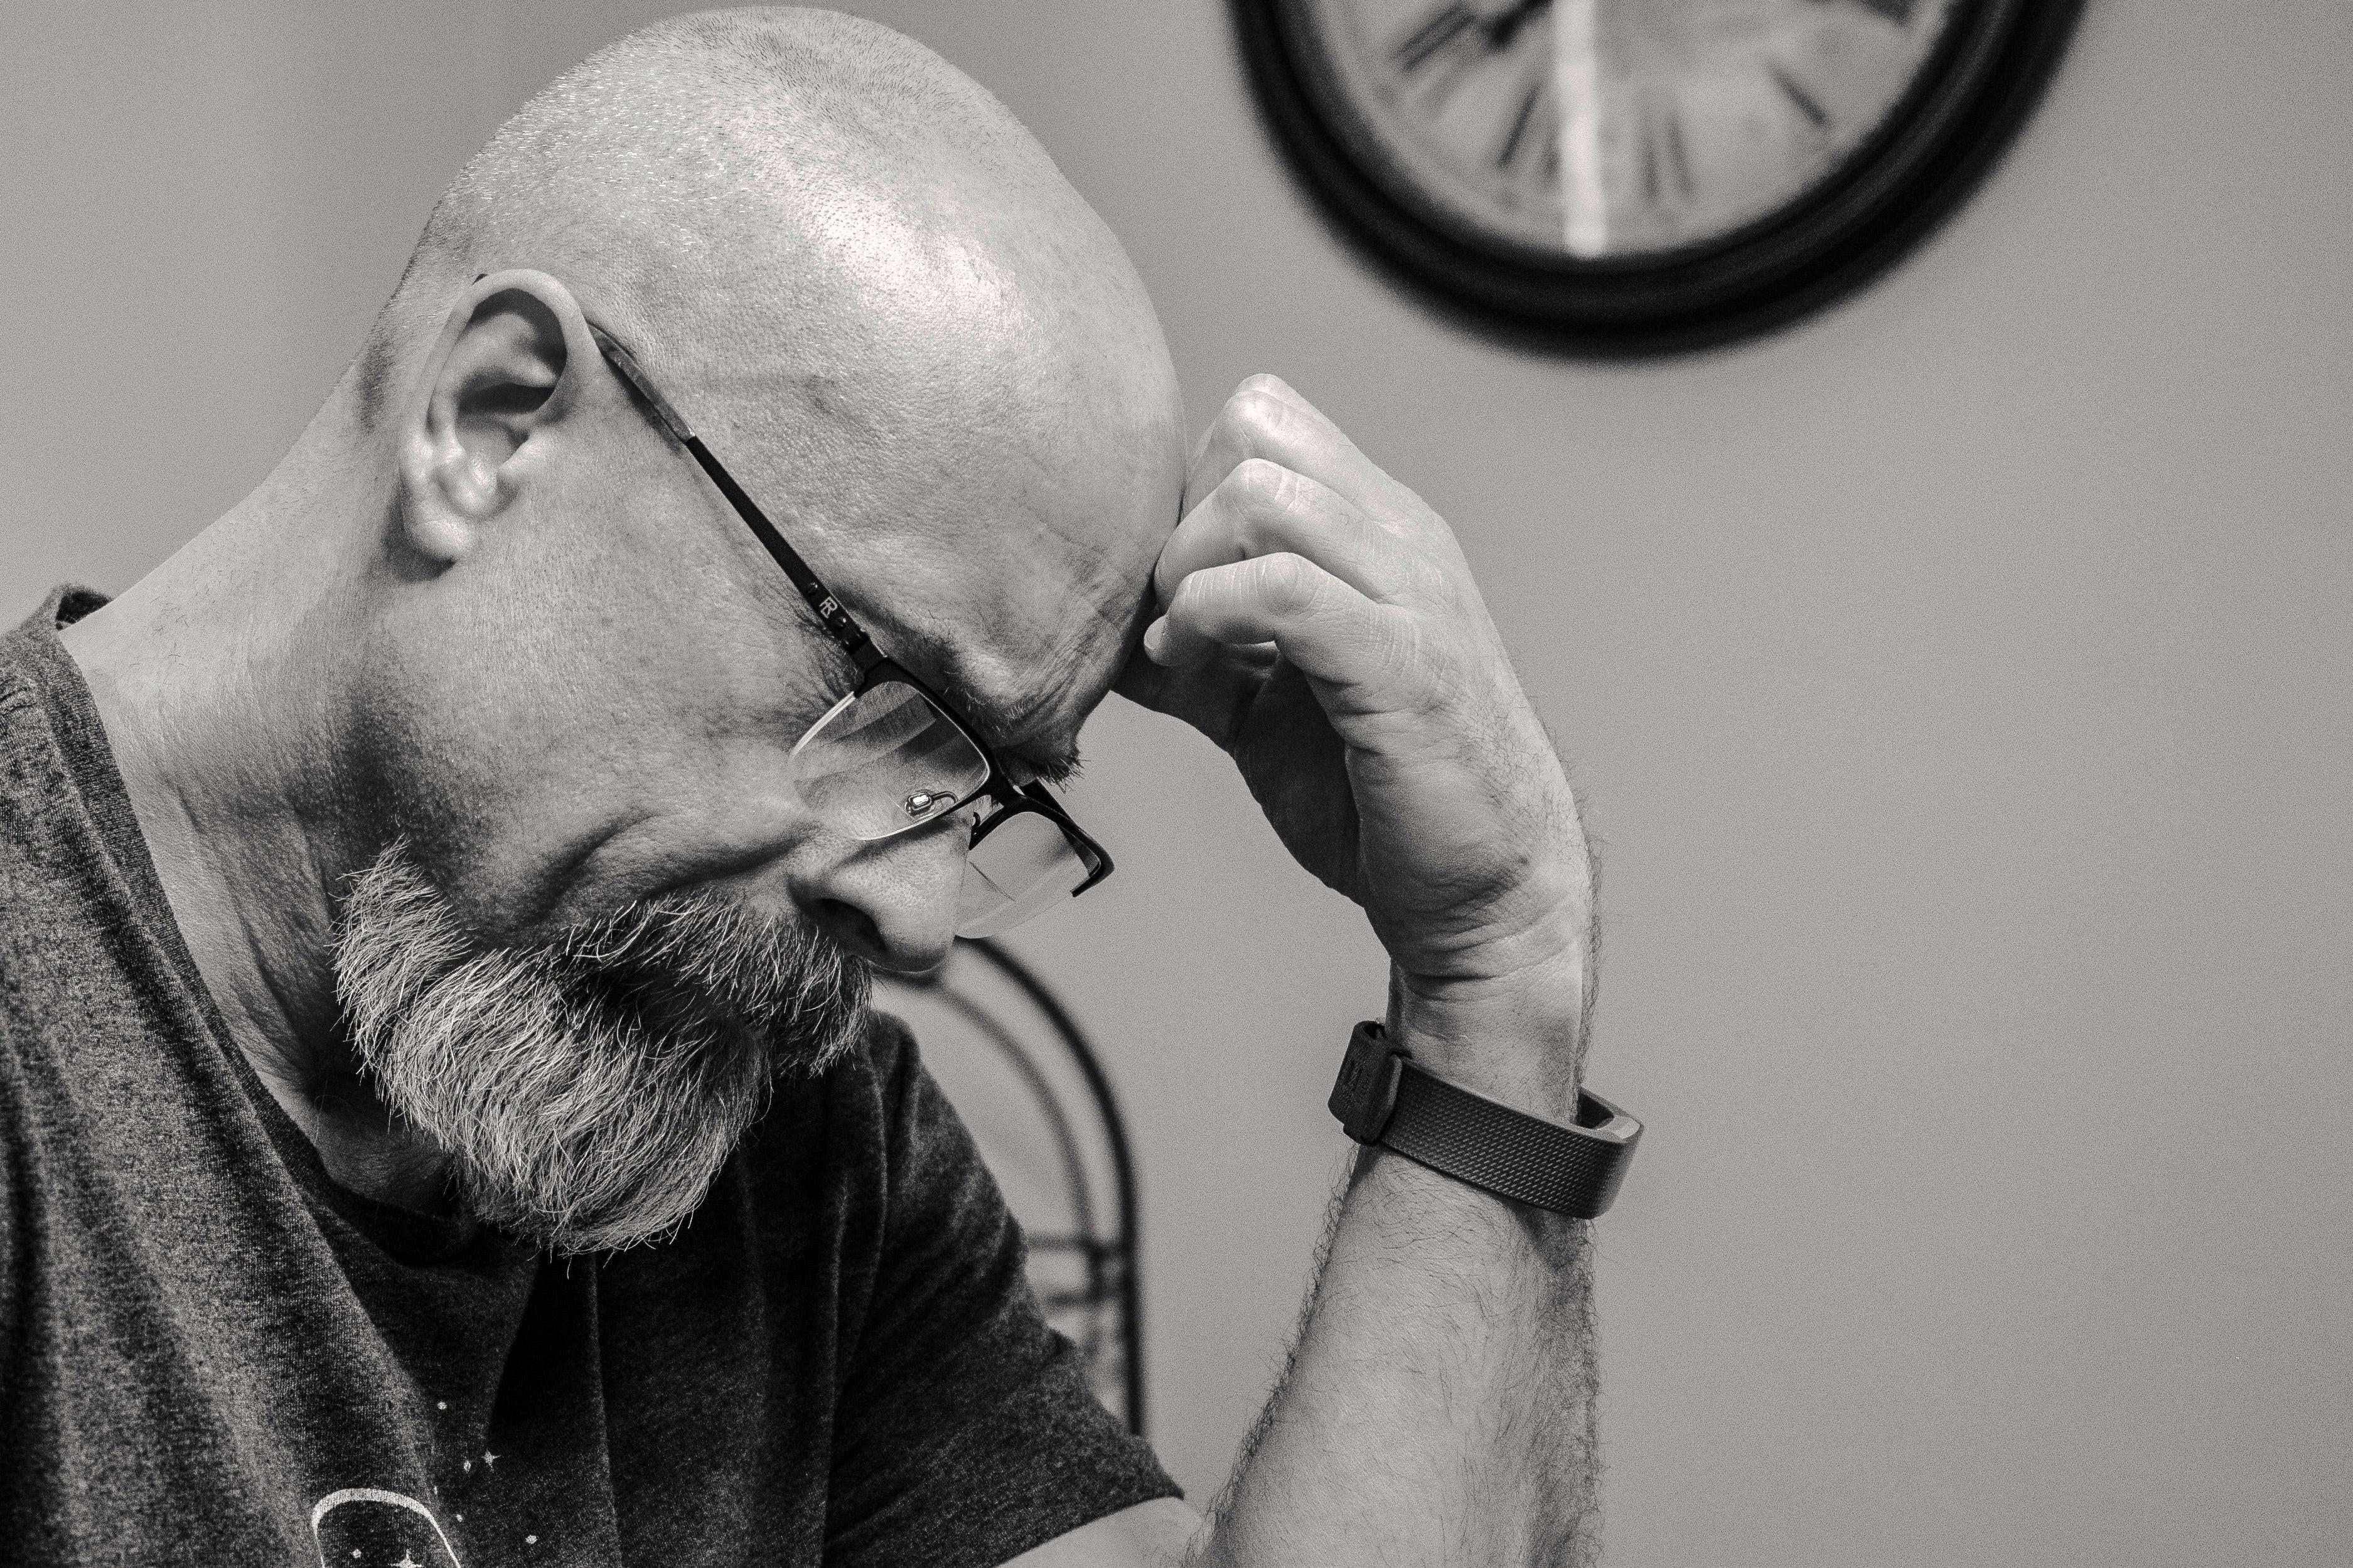 adult-bald-beard-1194196-1